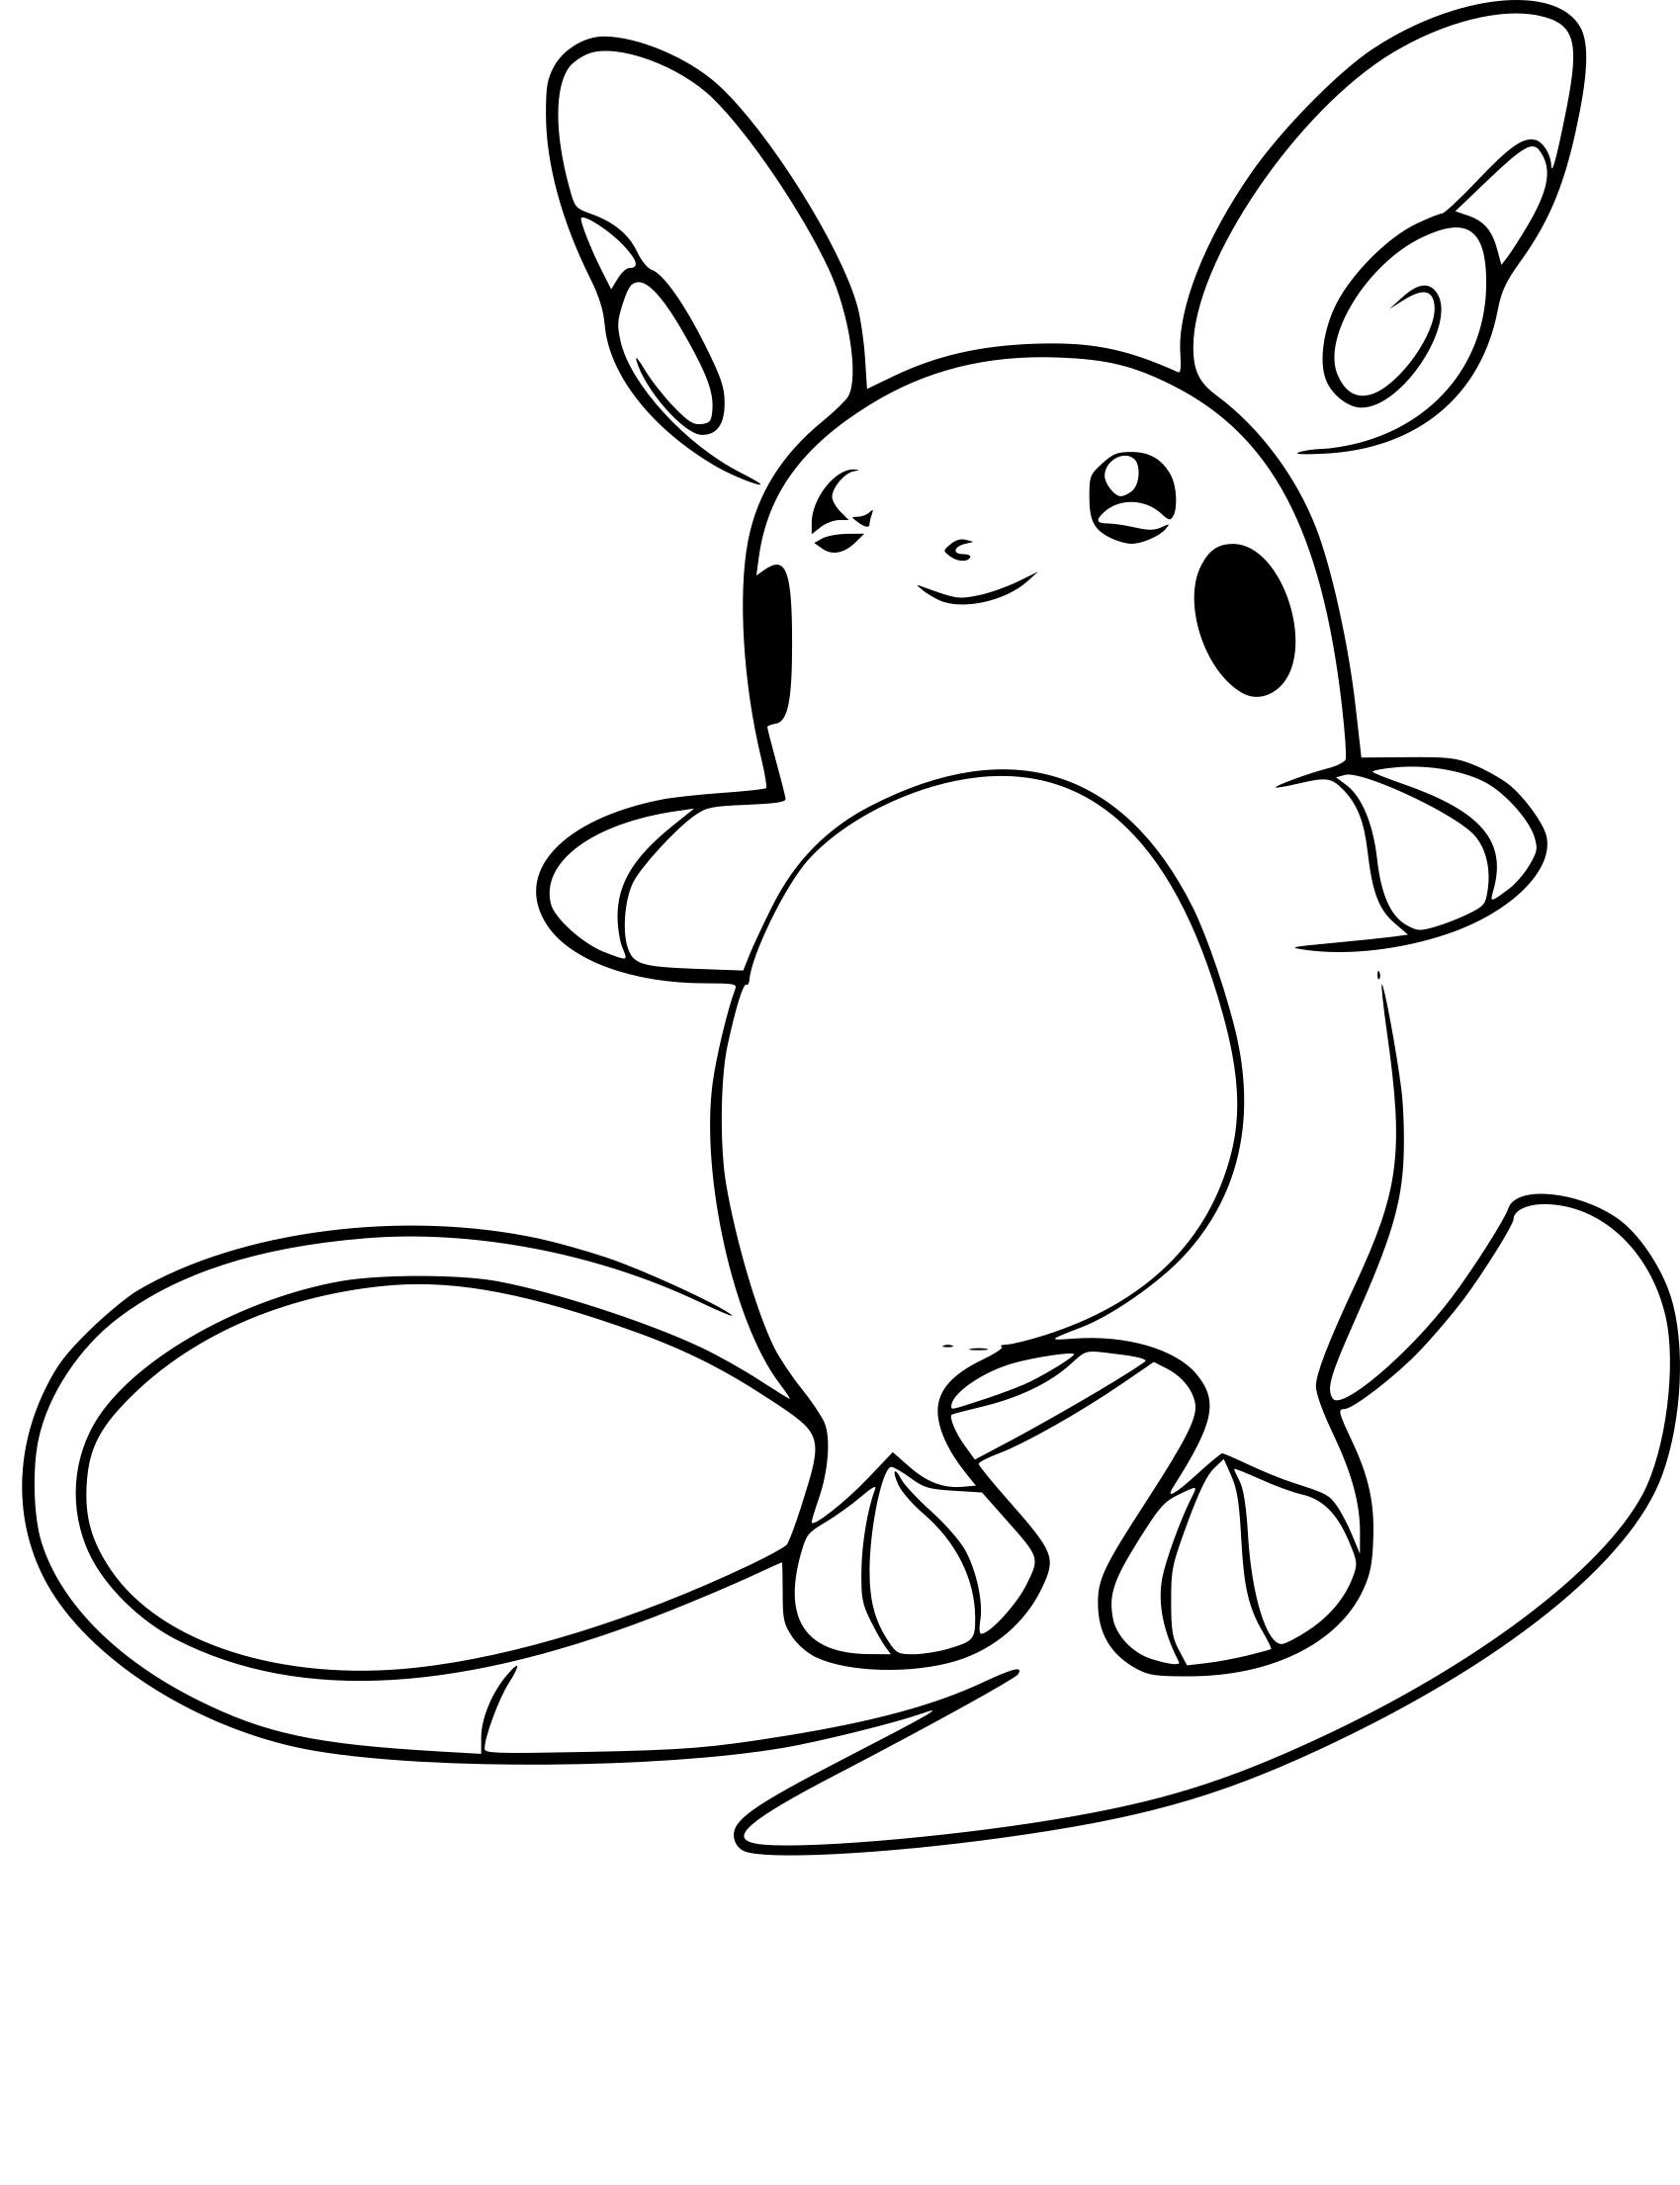 Dessin a imprimer pokemon kawaii dessin de manga - Coloriage pokemon imprimer ...